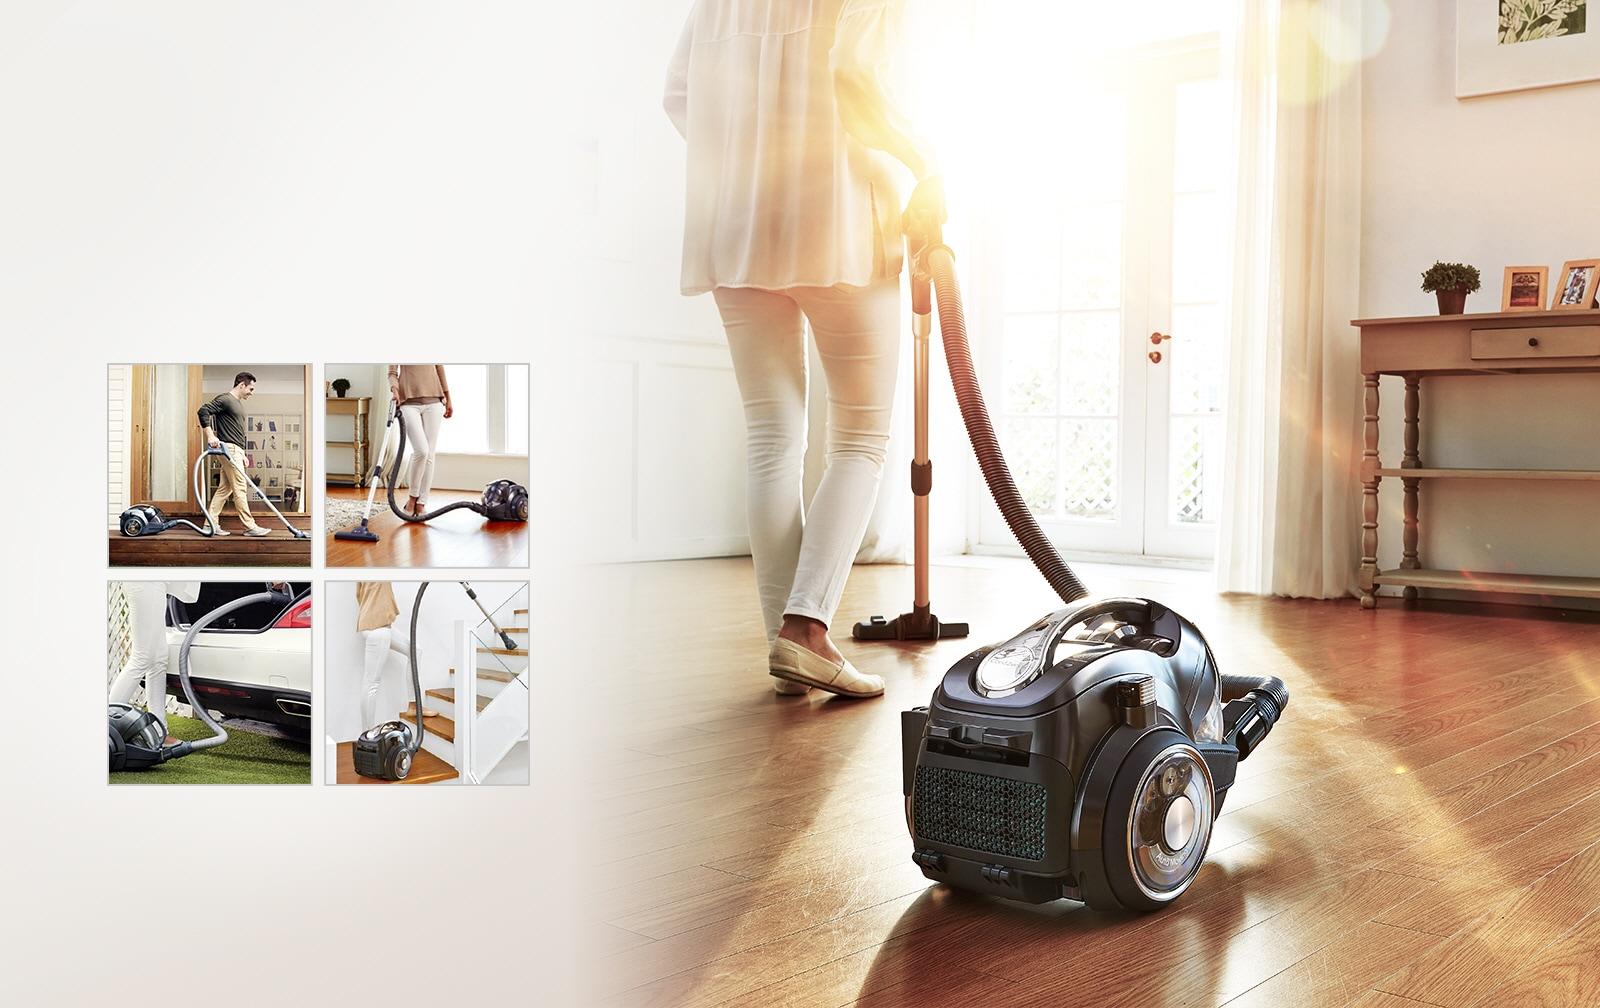 Lg Cordzero Handstick Cordless Vacuum Cleaner With Smart